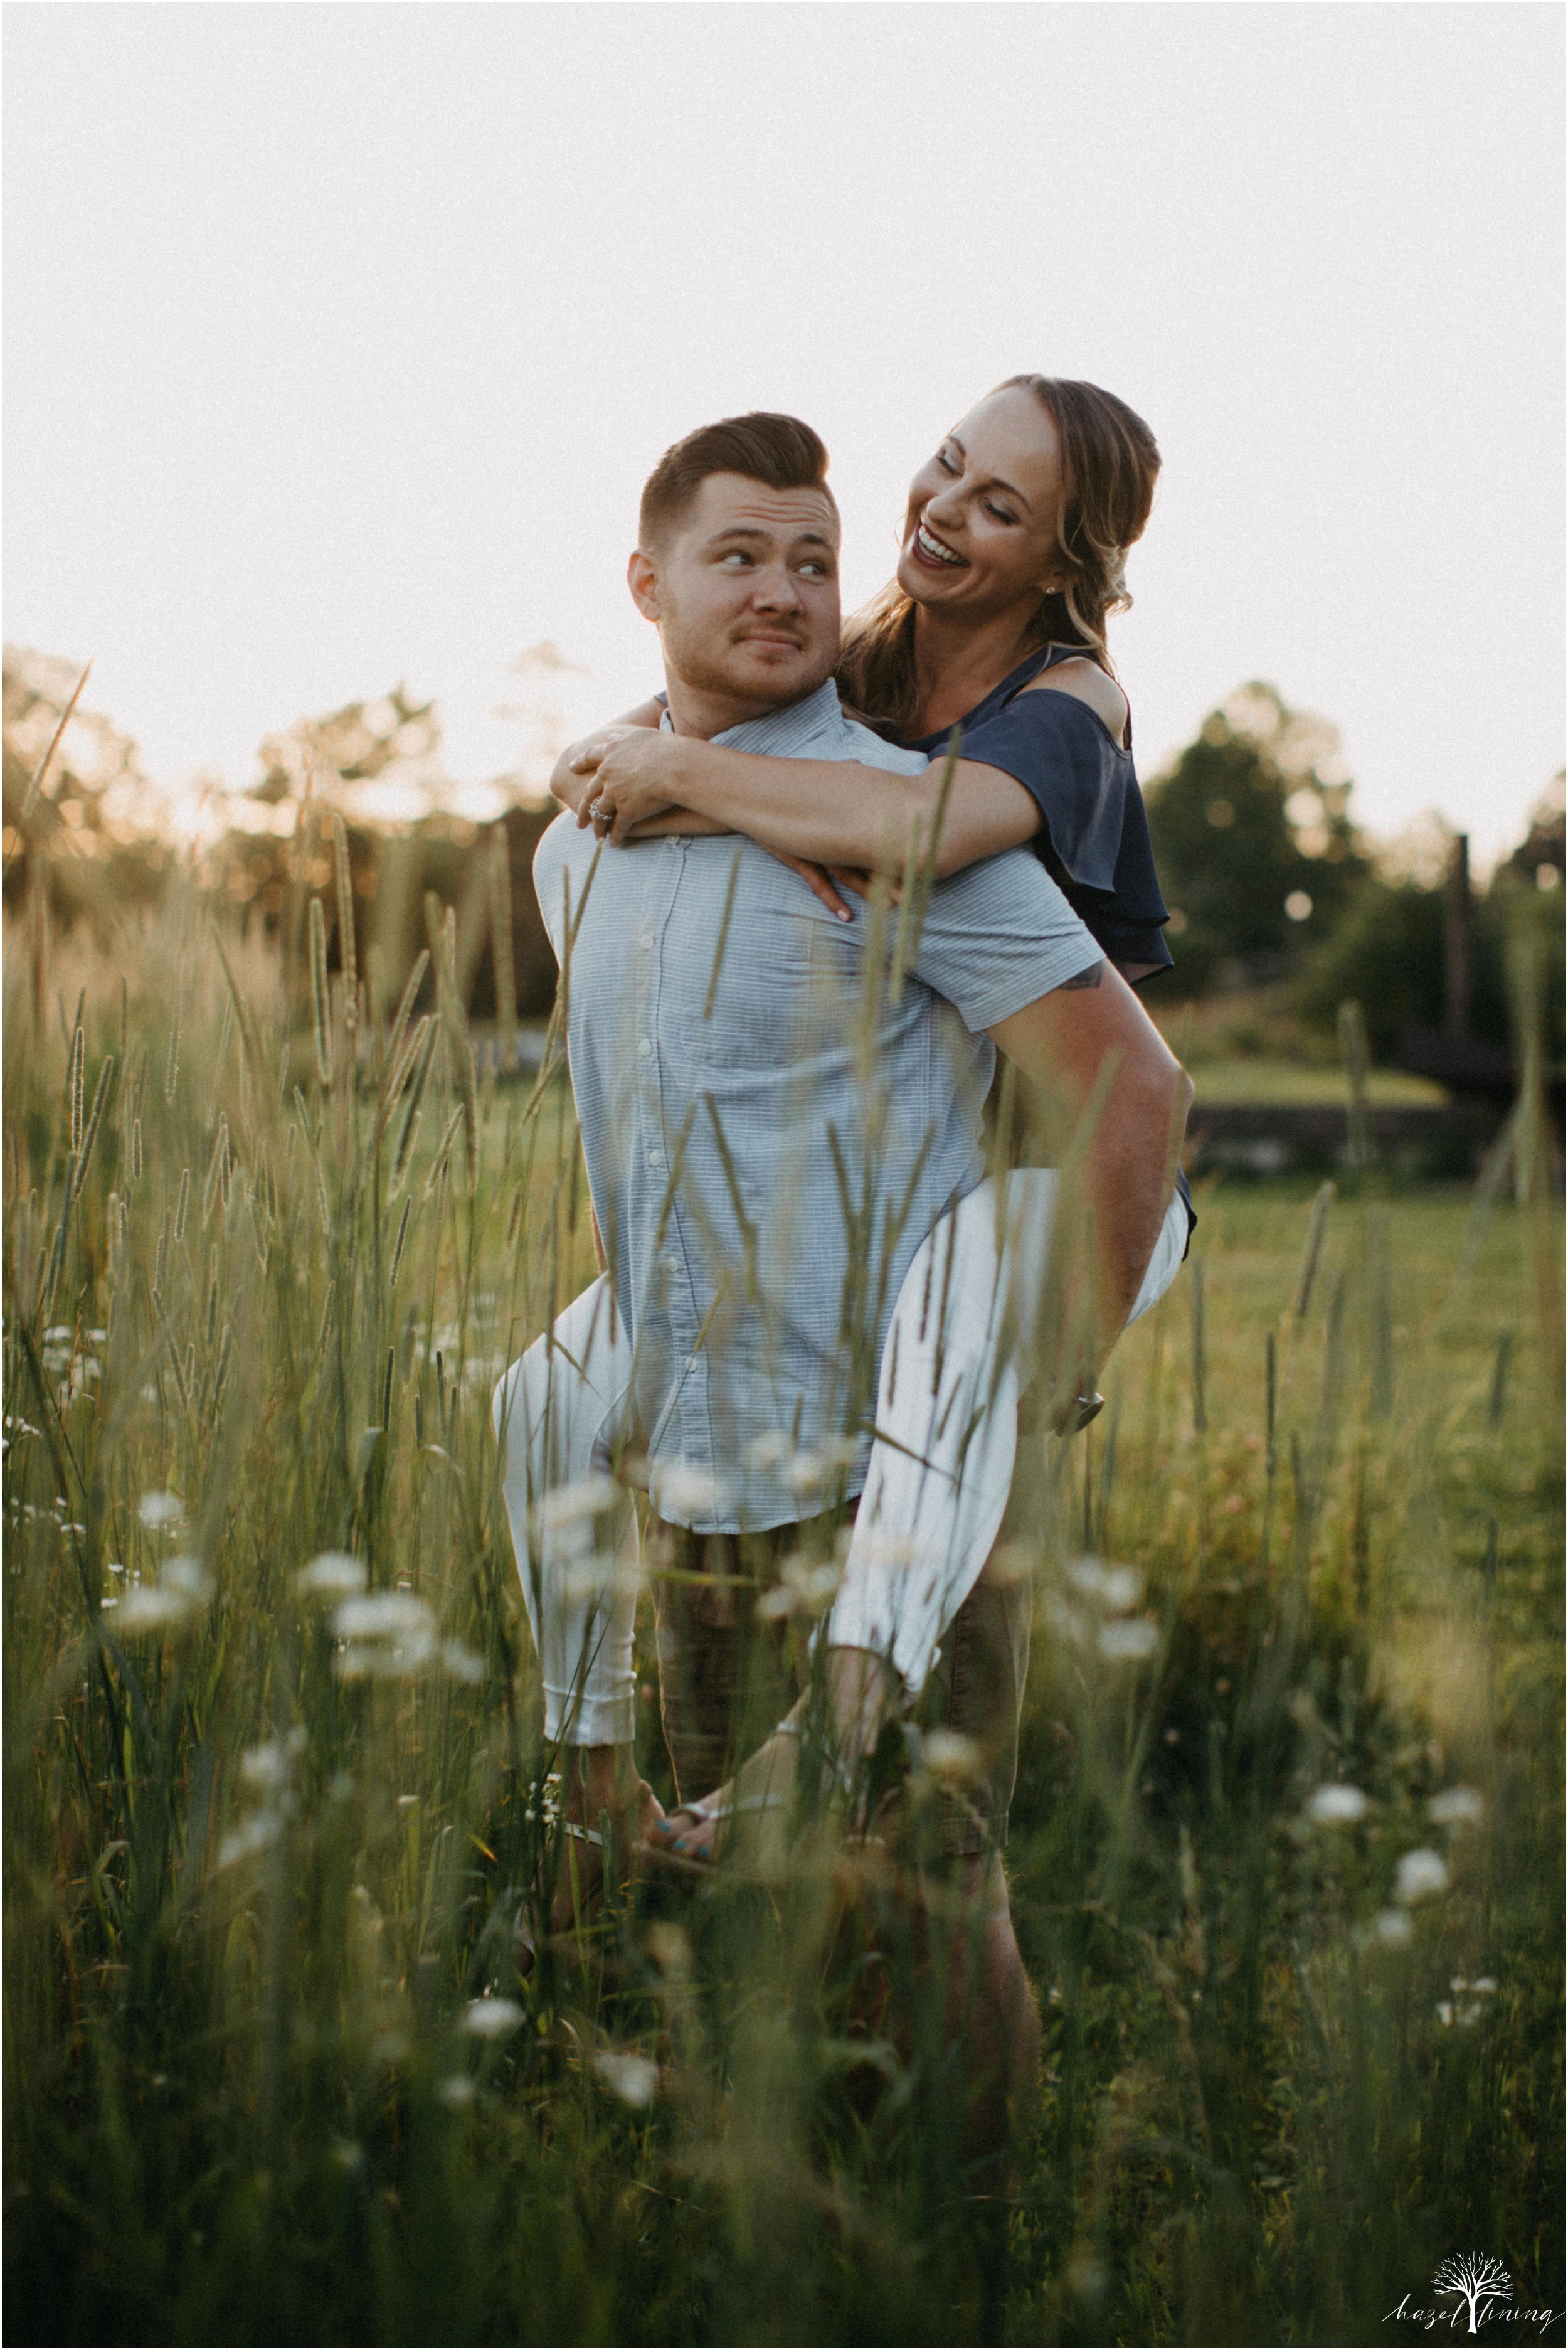 rachel-warner-chris-niedrist-the-farm-bakery-and-events-quakertown-pa-summer-engagement-hazel-lining-photography-destination-elopement-wedding-engagement-photography_0034.jpg